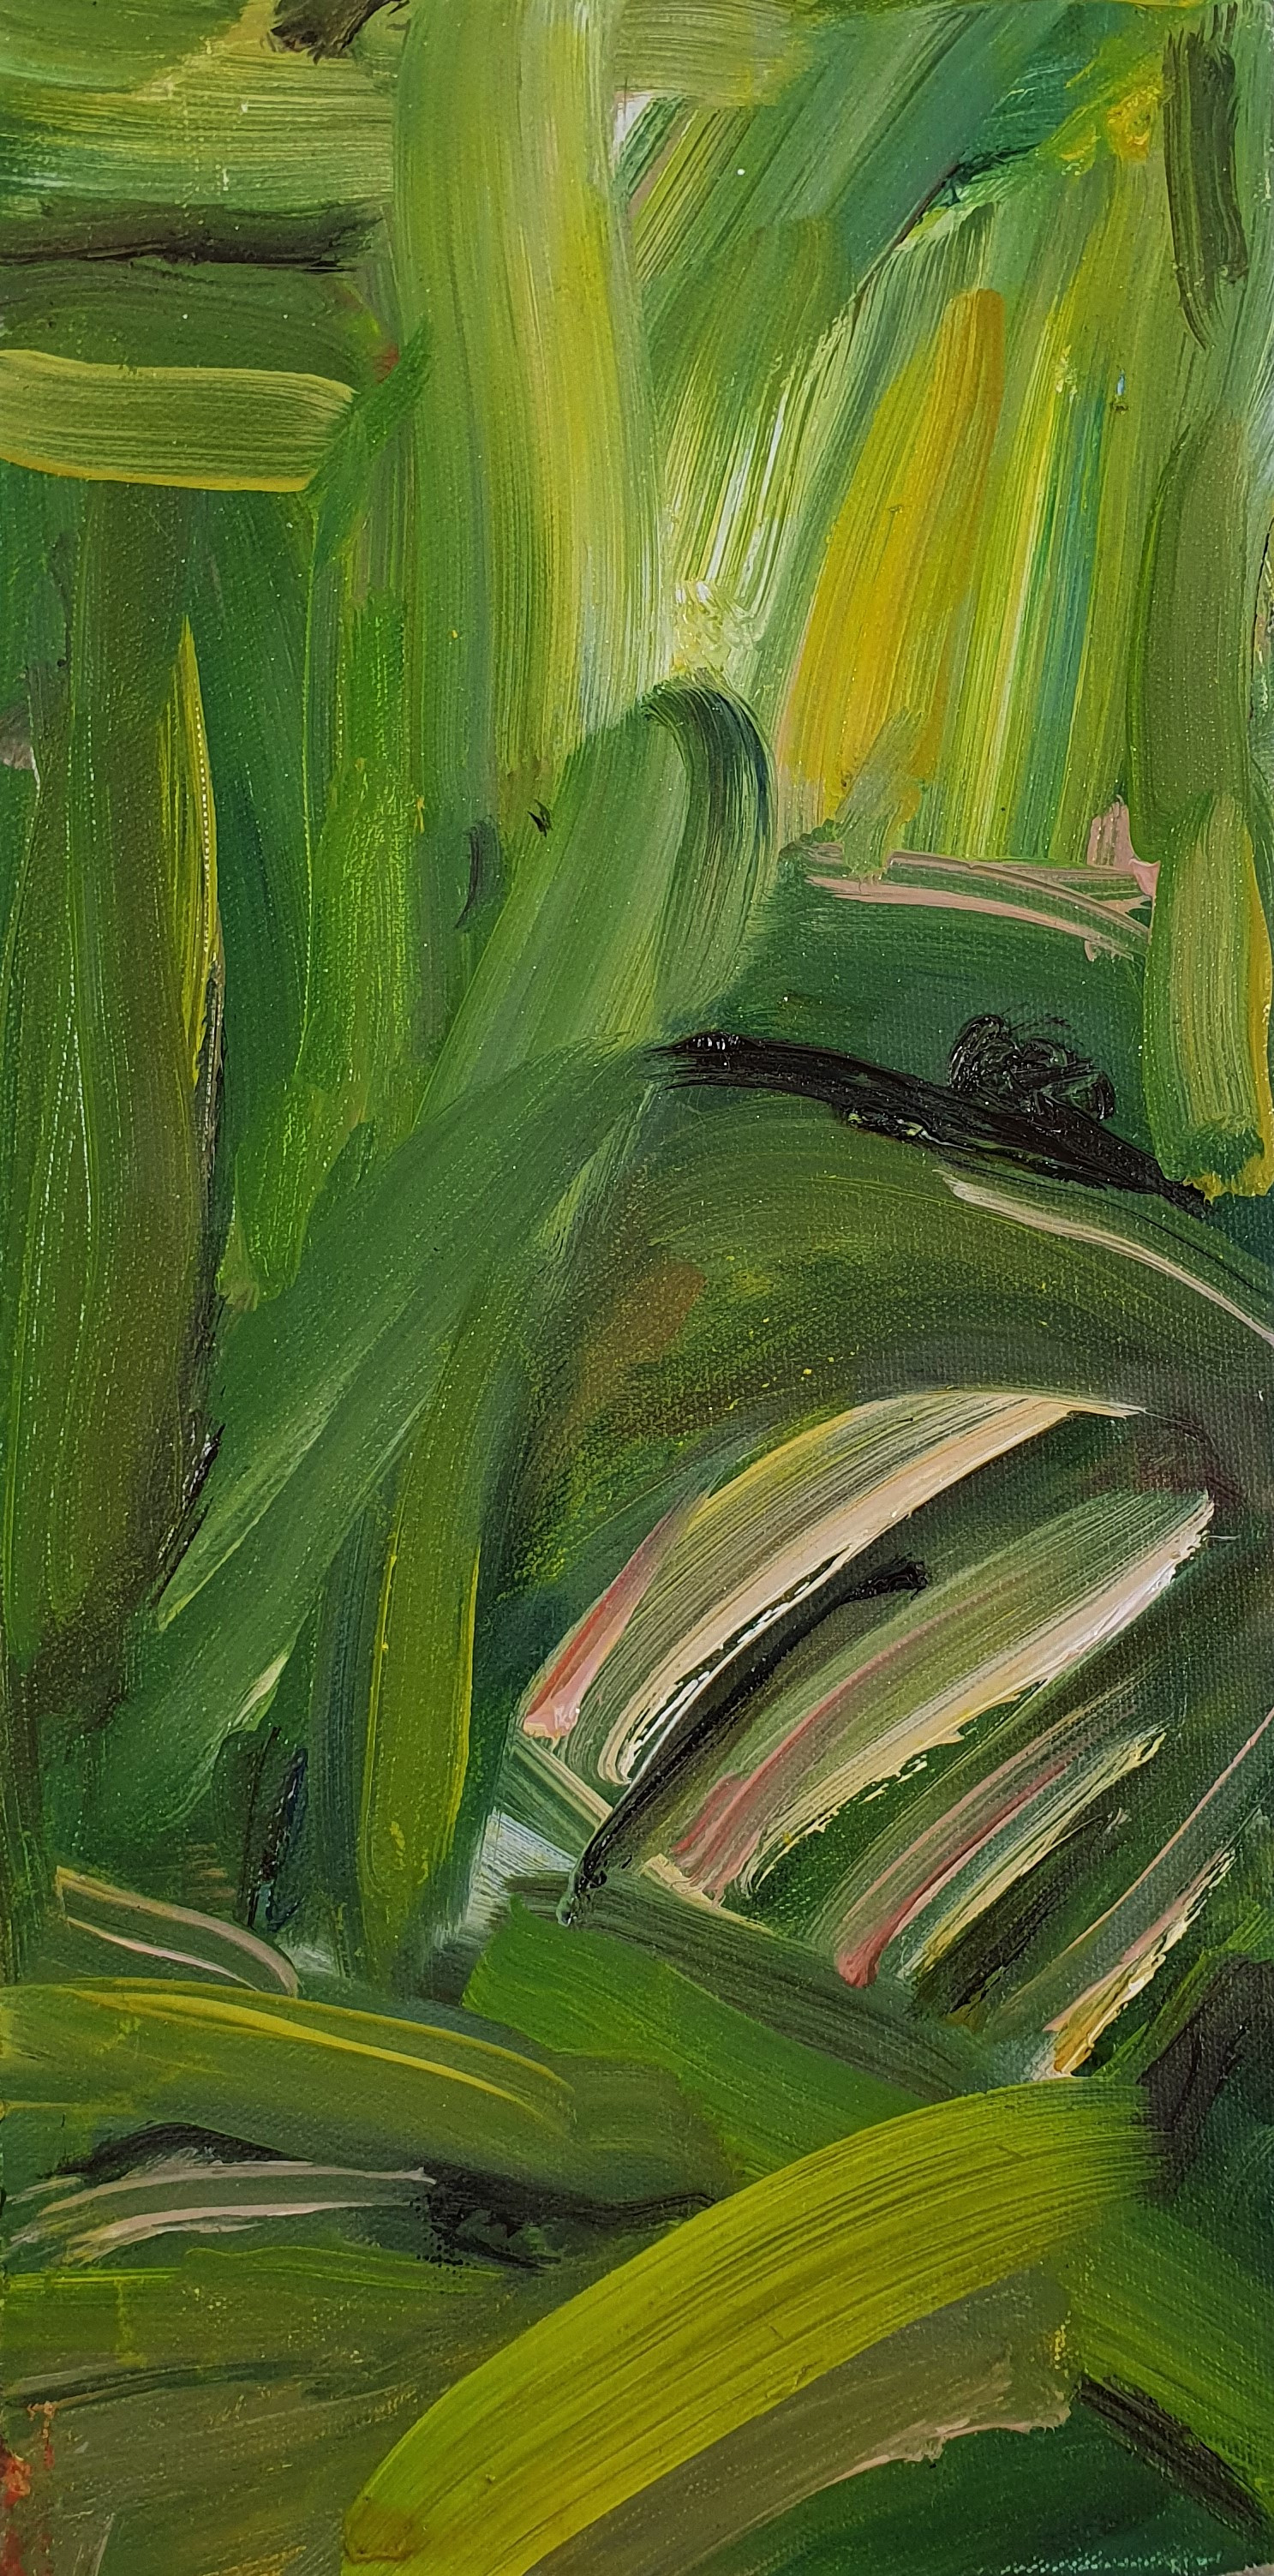 28. Green